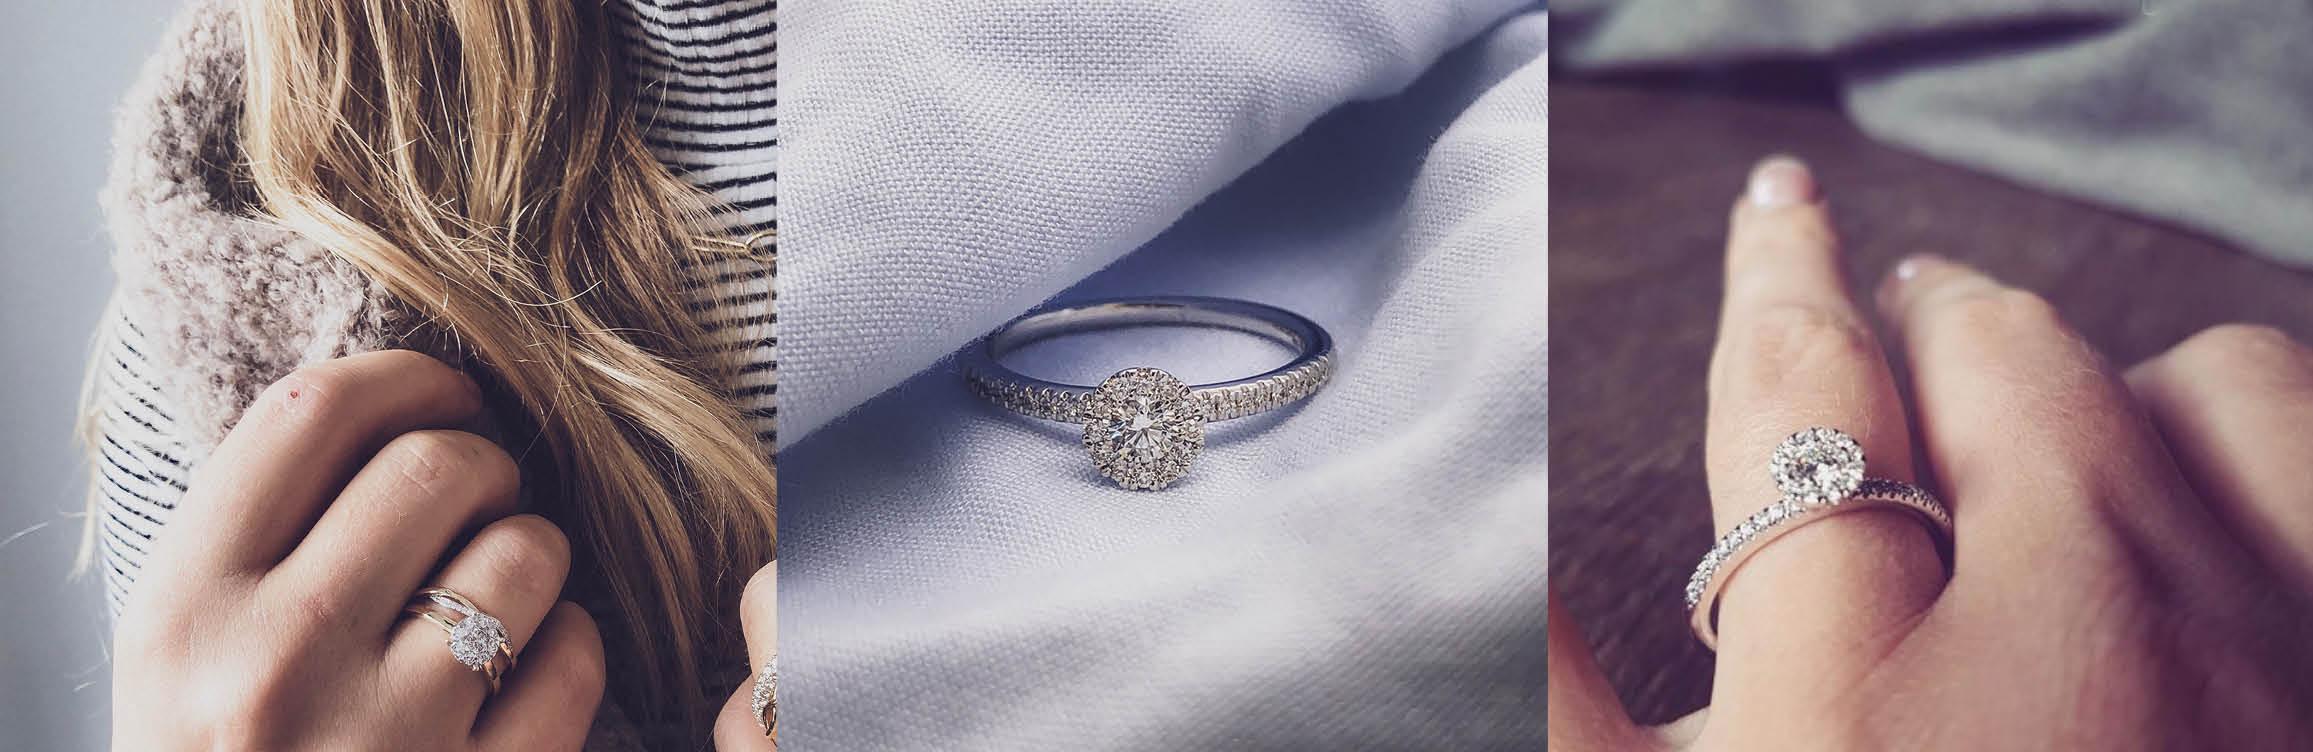 Excellent Gold Collection bij  Wolters Juweliers Coevorden Emmen